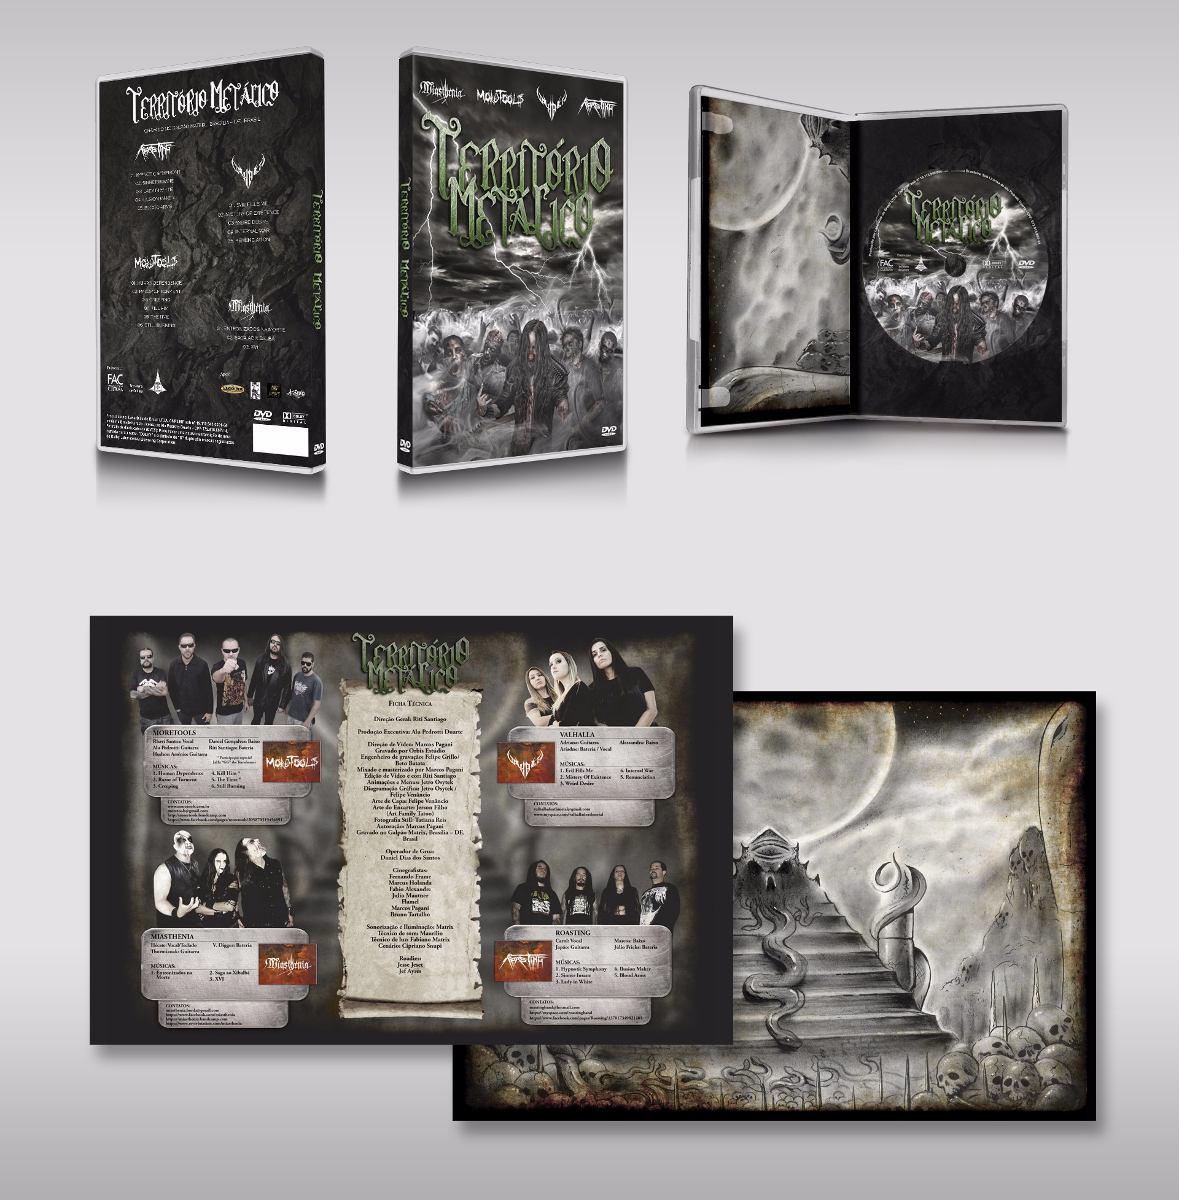 dvd-territorio-metalico-799011-MLB20451752407_102015-F